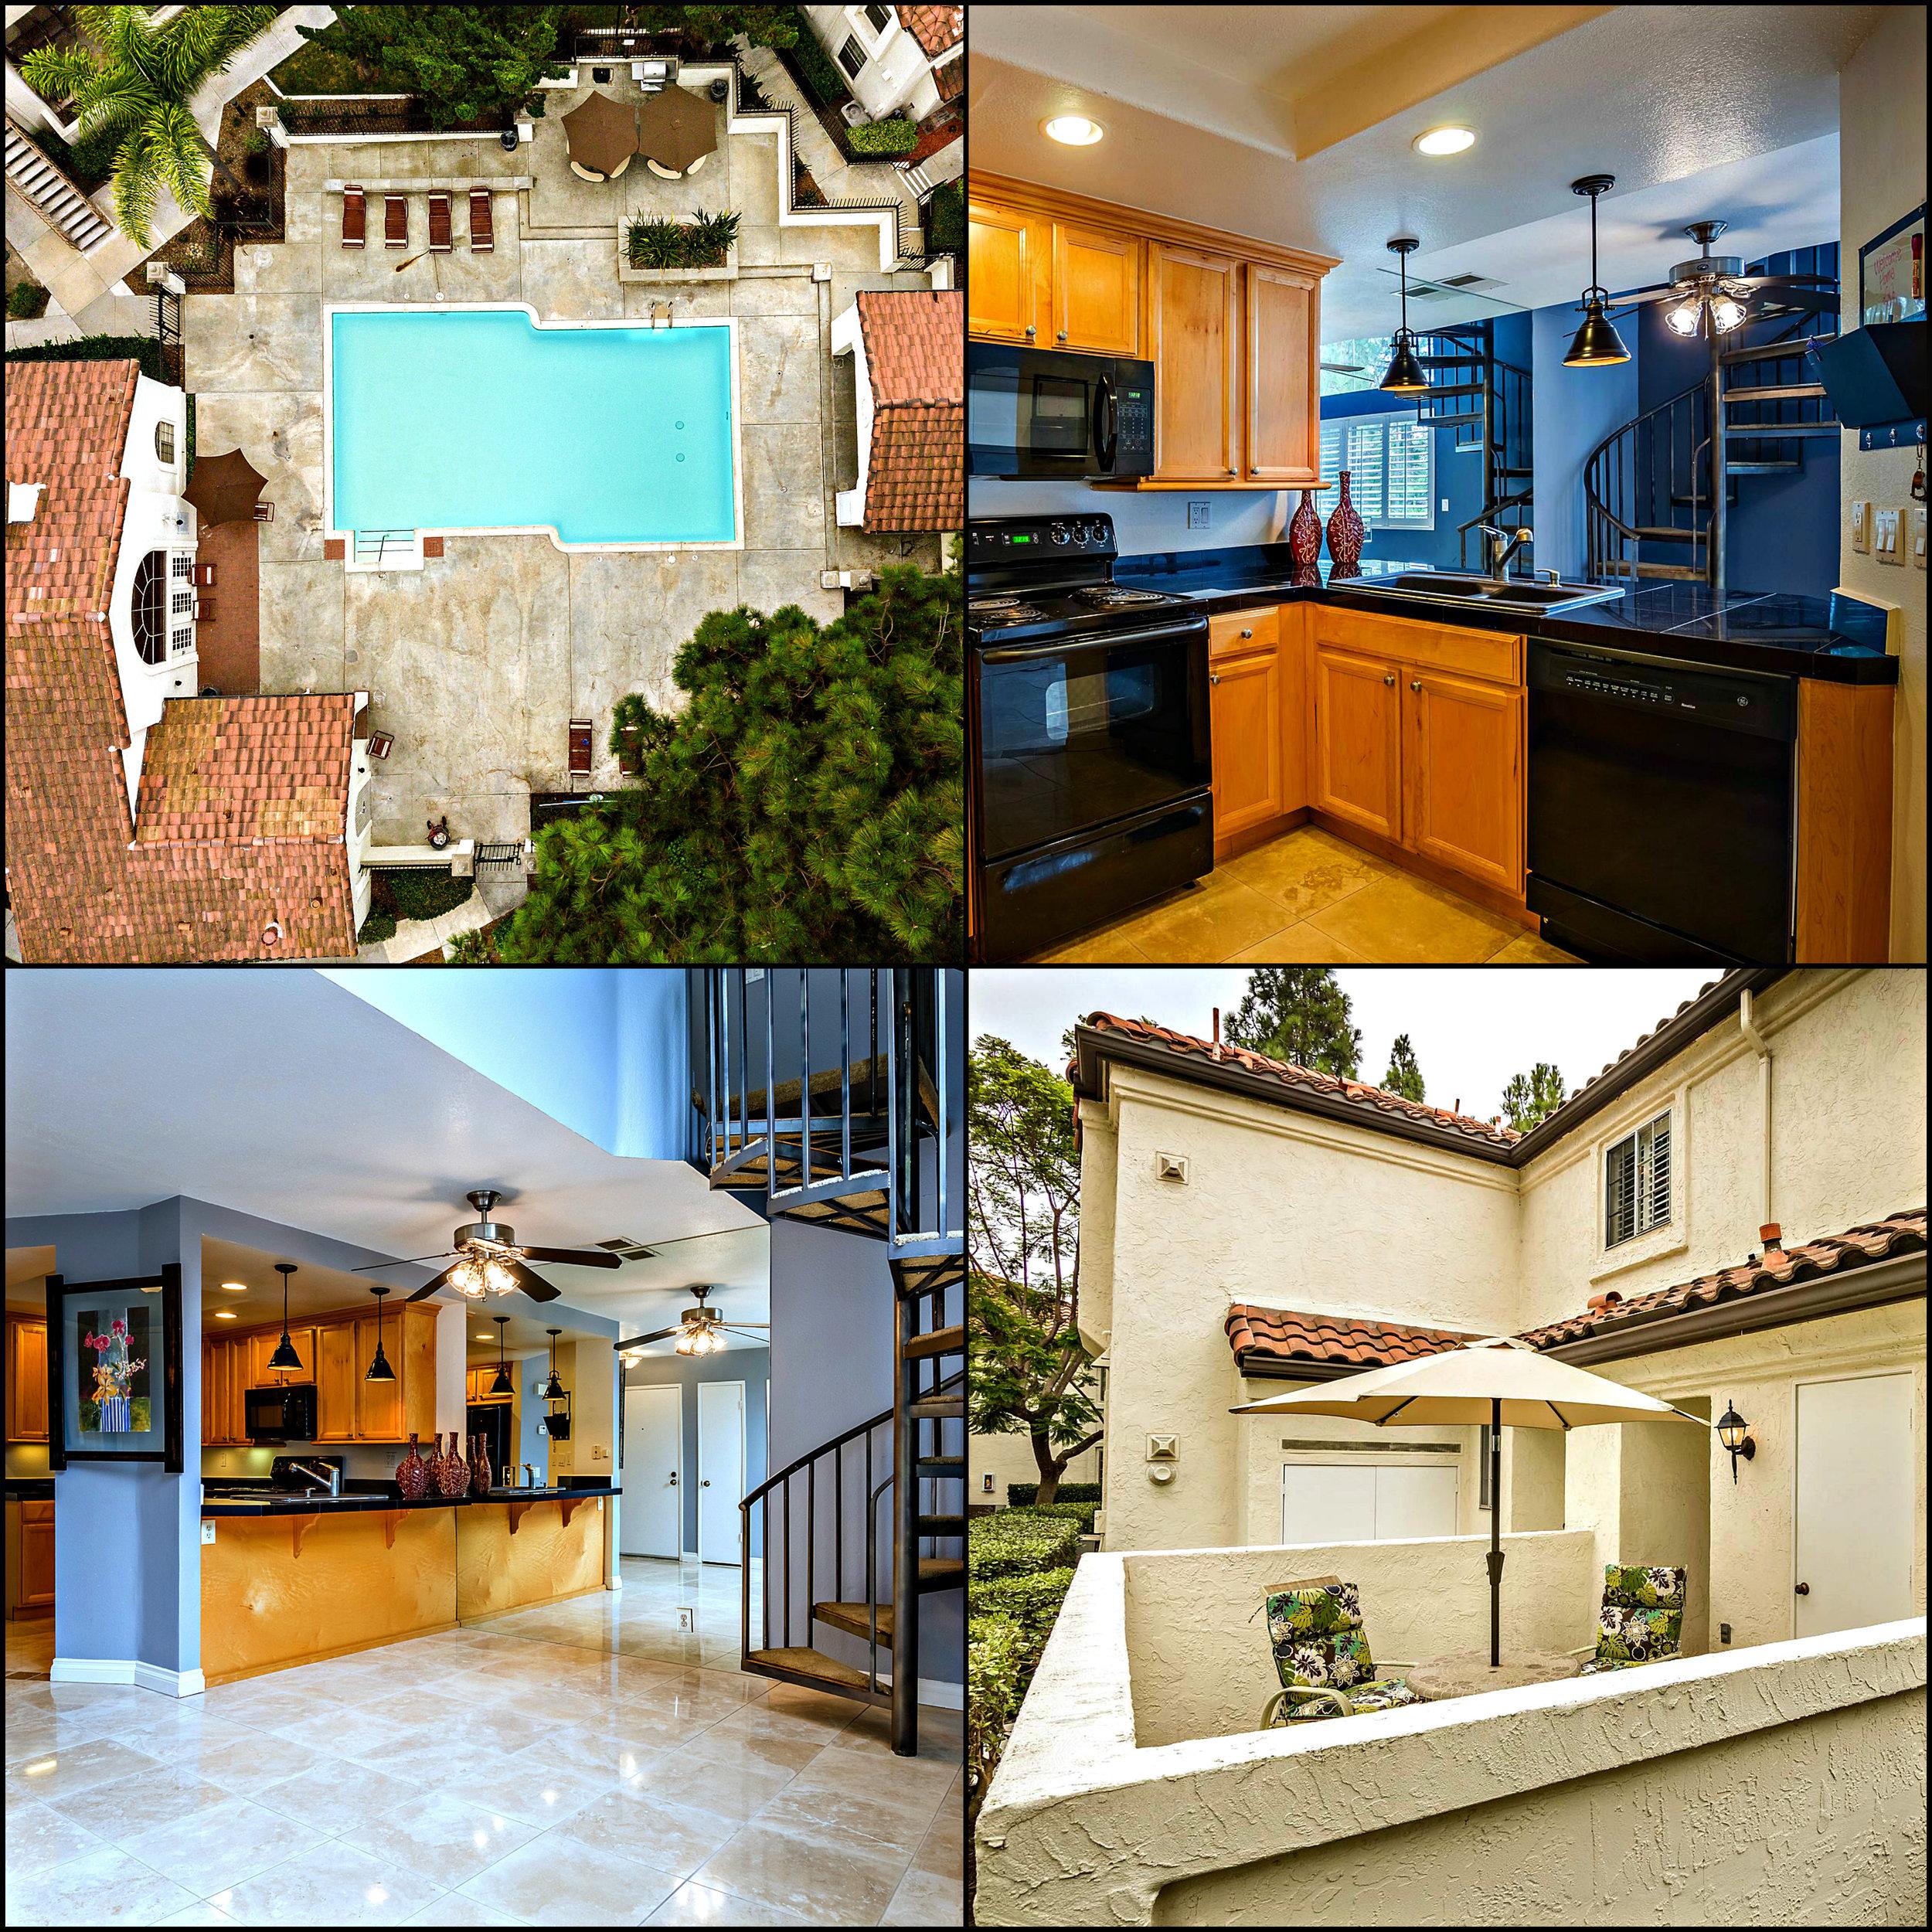 Rob Kaesler 738 Eastshore Terrace, Chula Vista collage.jpg